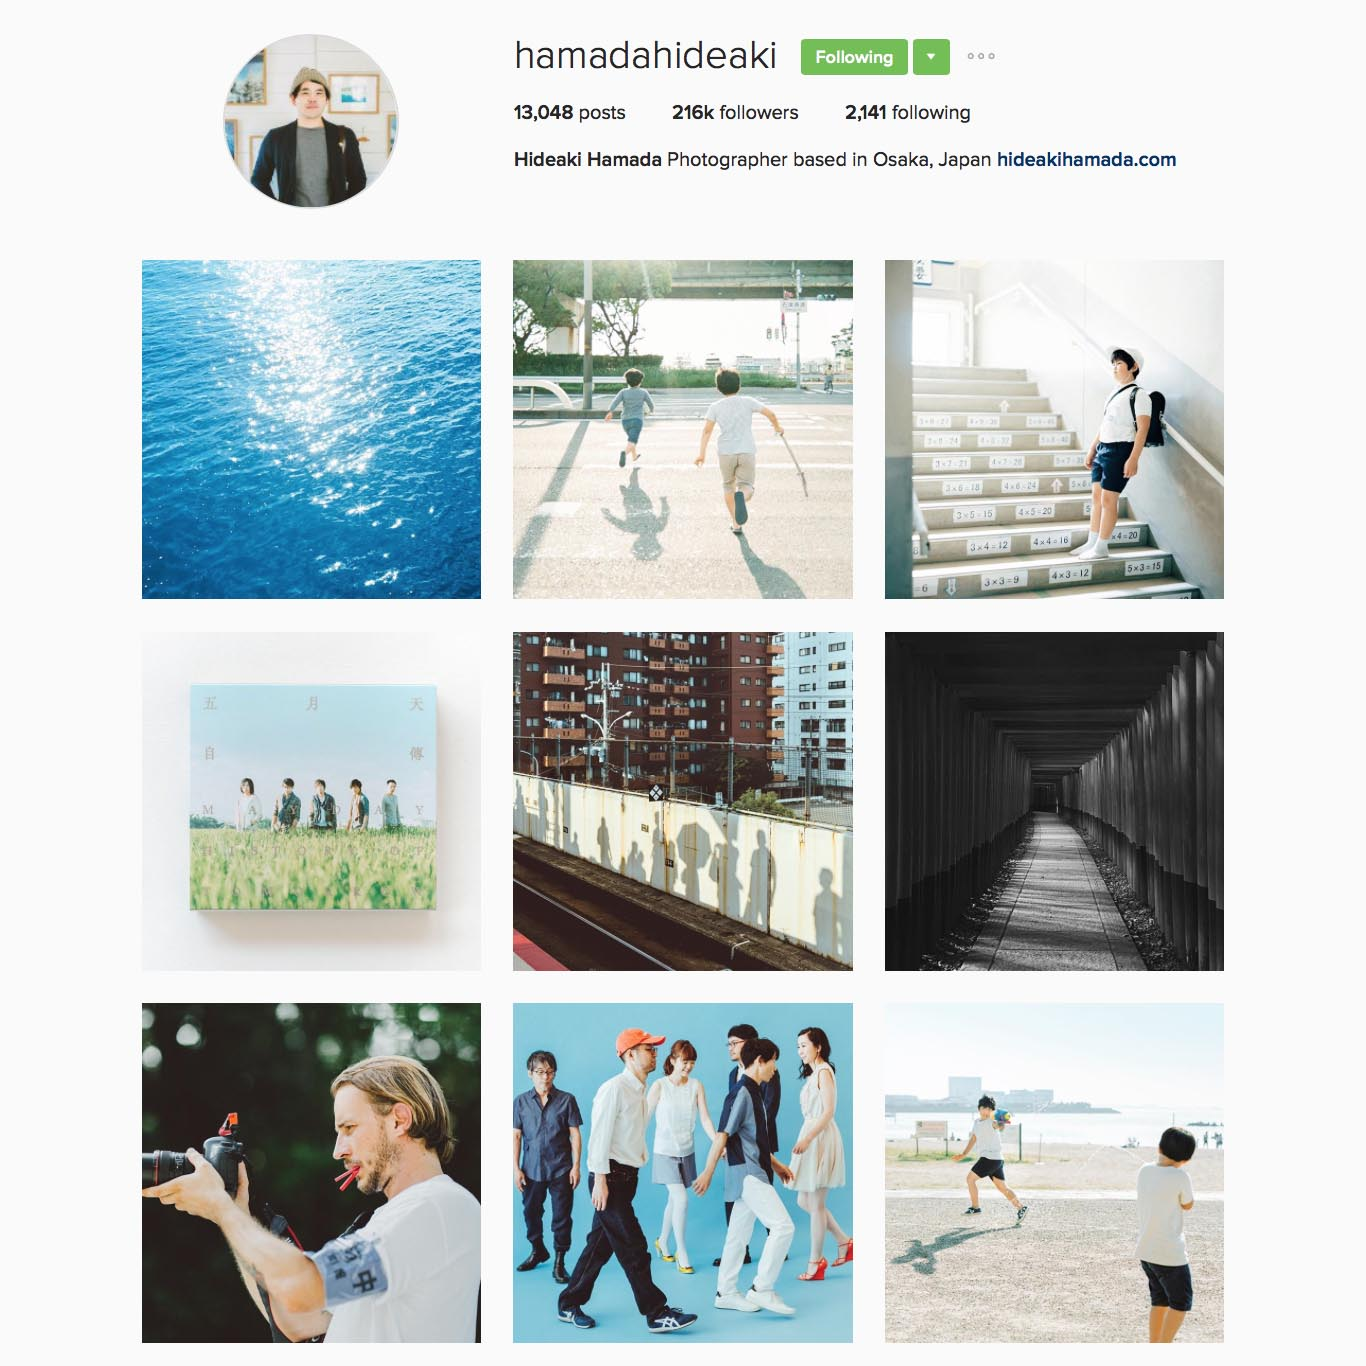 濱田英明 Hideaki Hamada (@hamadahideaki),日本大阪攝影師,2012年出版攝影集『Haru and Mina』。作品常發表於KINFOLK magazine, FRAME magazine, THE BIG ISSUE TAIWAN。